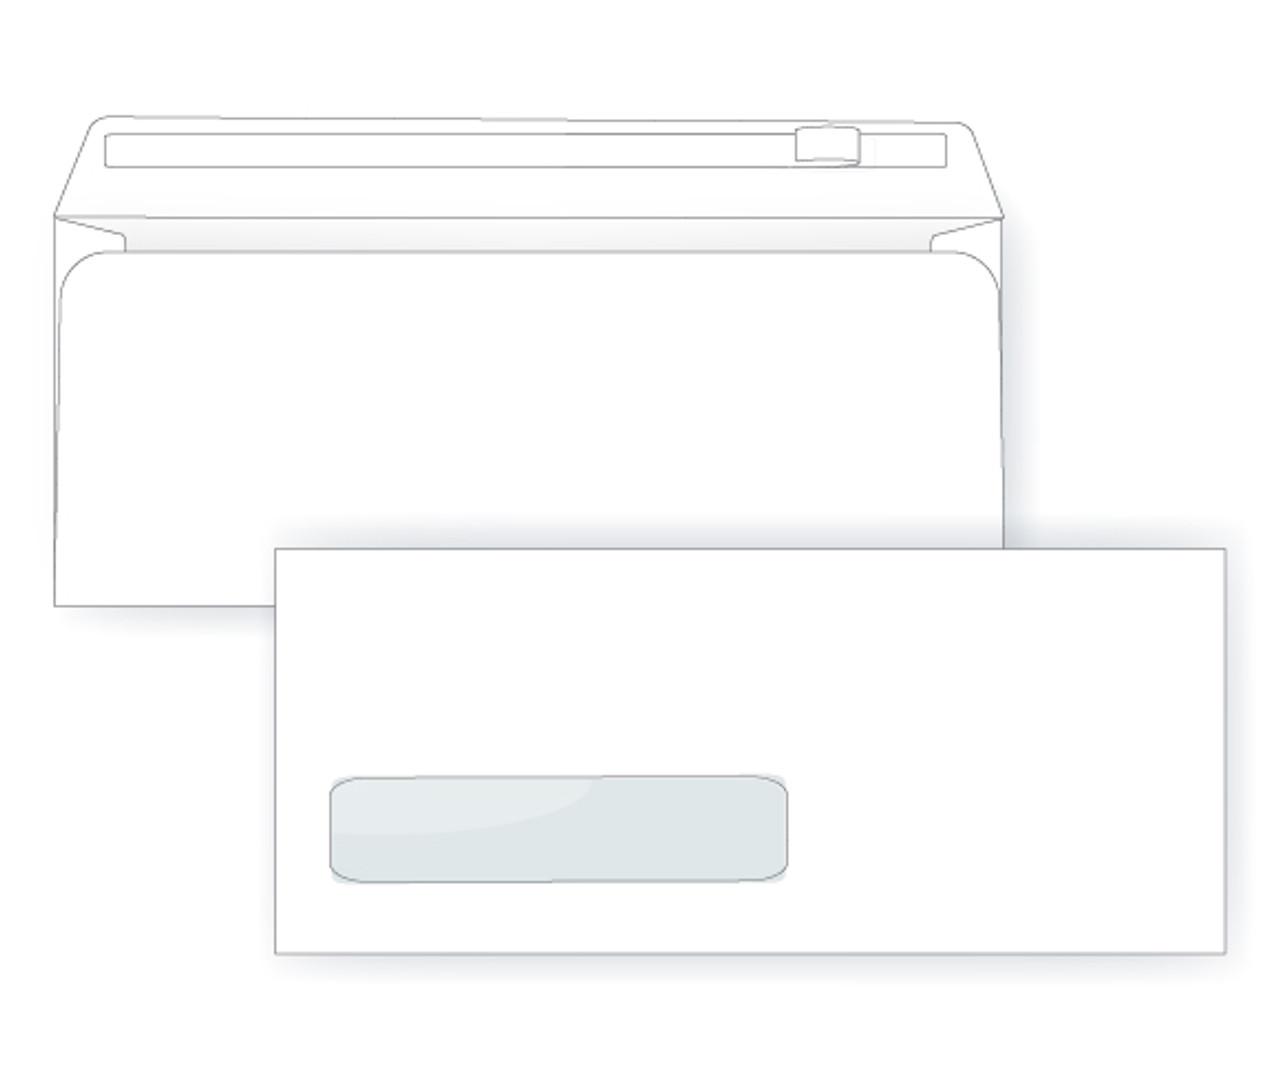 #10 Self Seal Digital Envelopes   Digital Window Envelopes - EB1506